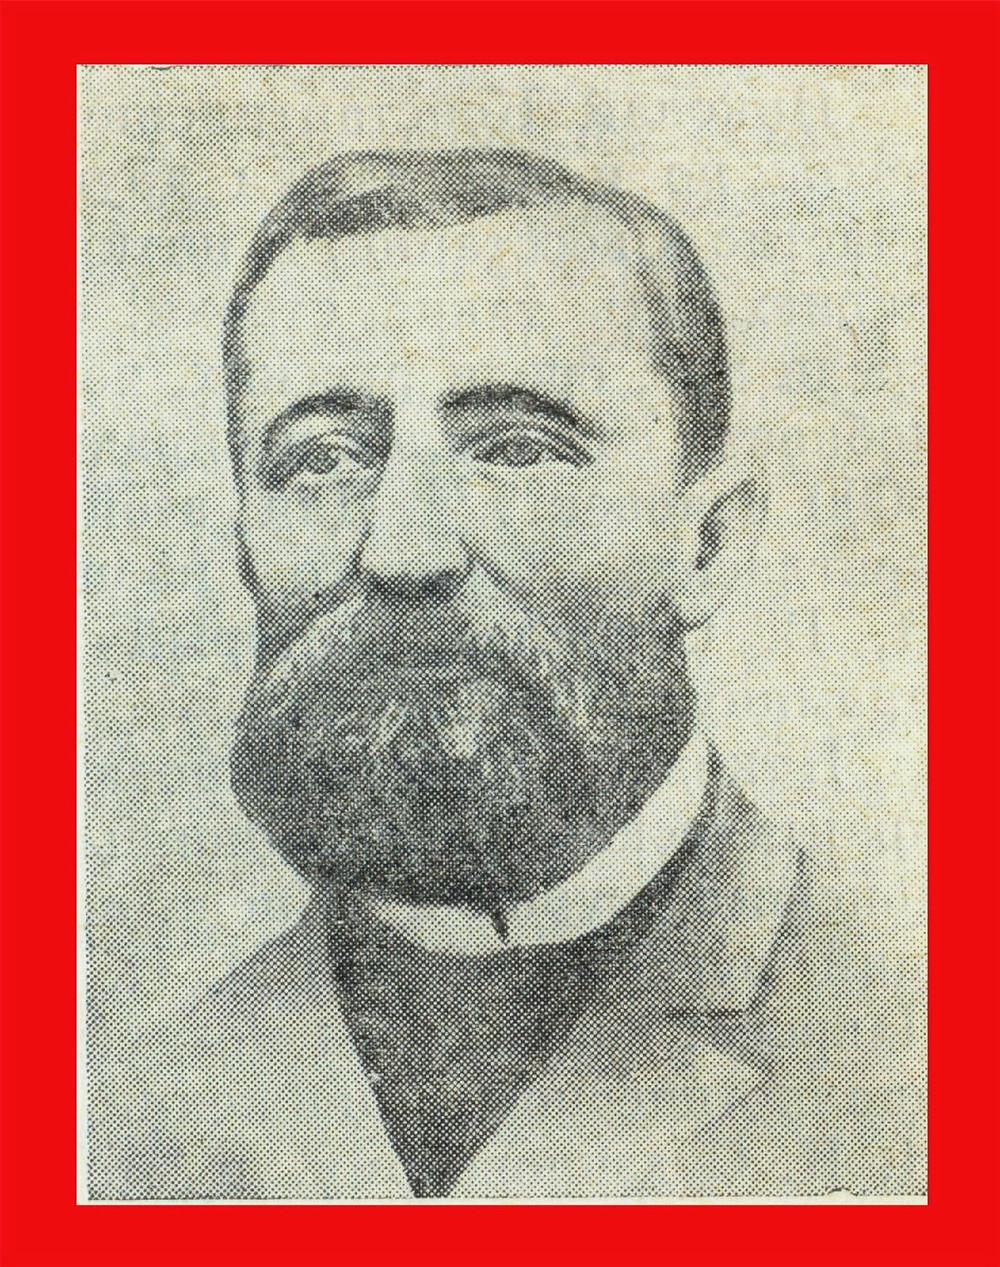 Russel Sudzilovskii (1850-1930) Image: Public Domain